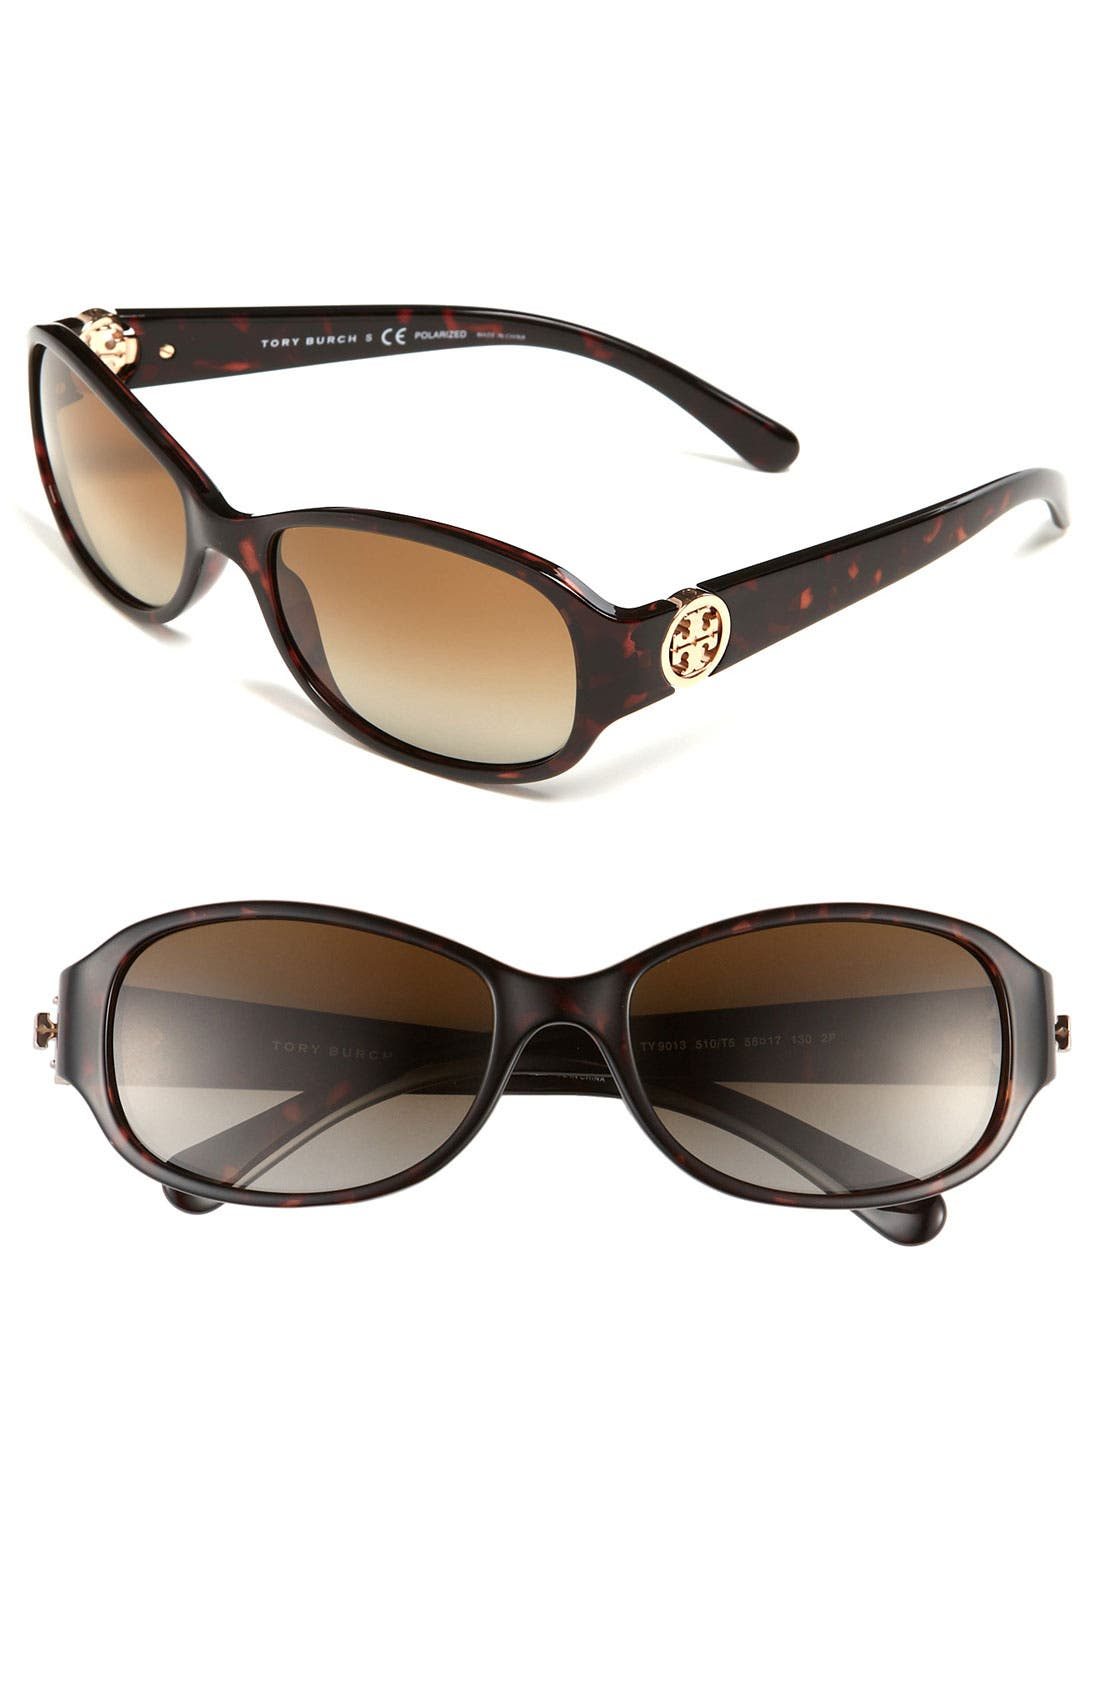 Main Image - Tory Burch 56mm Polarized Sunglasses